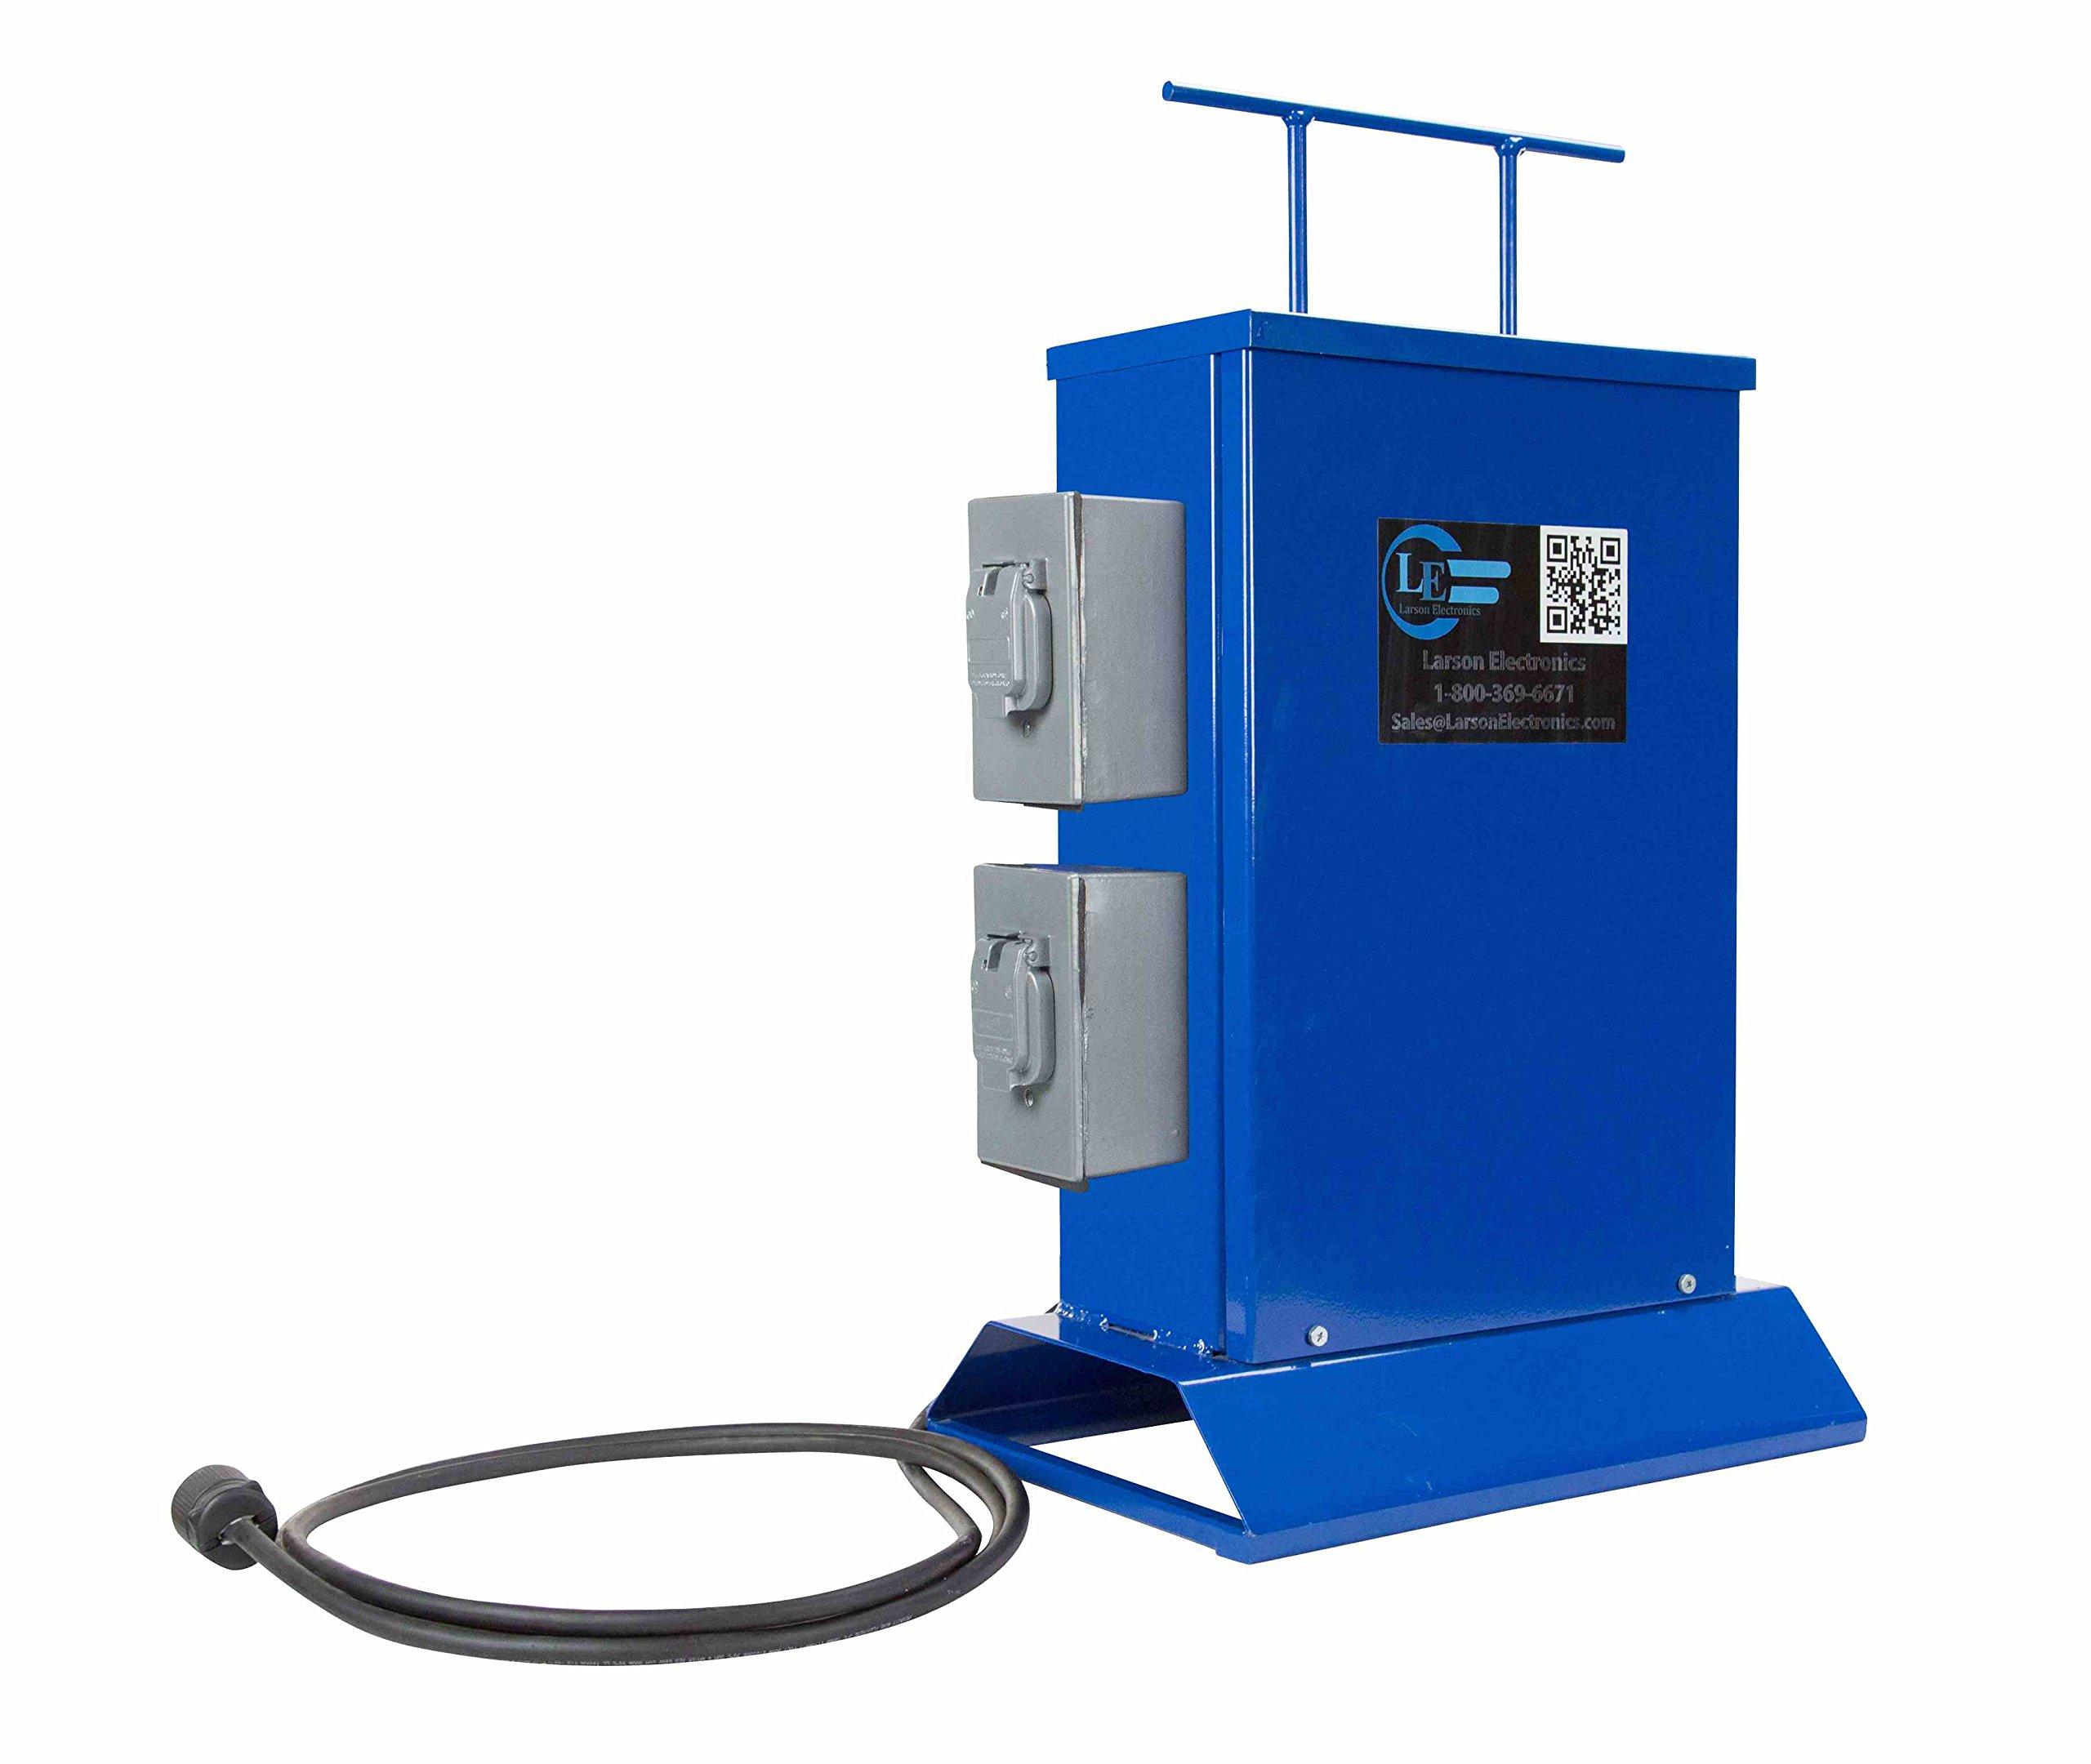 Transformer - 3000 VA - Converts 120V or 240V AC to Low Voltage AC/DC Outlets - 2 Twist Lock Outlets